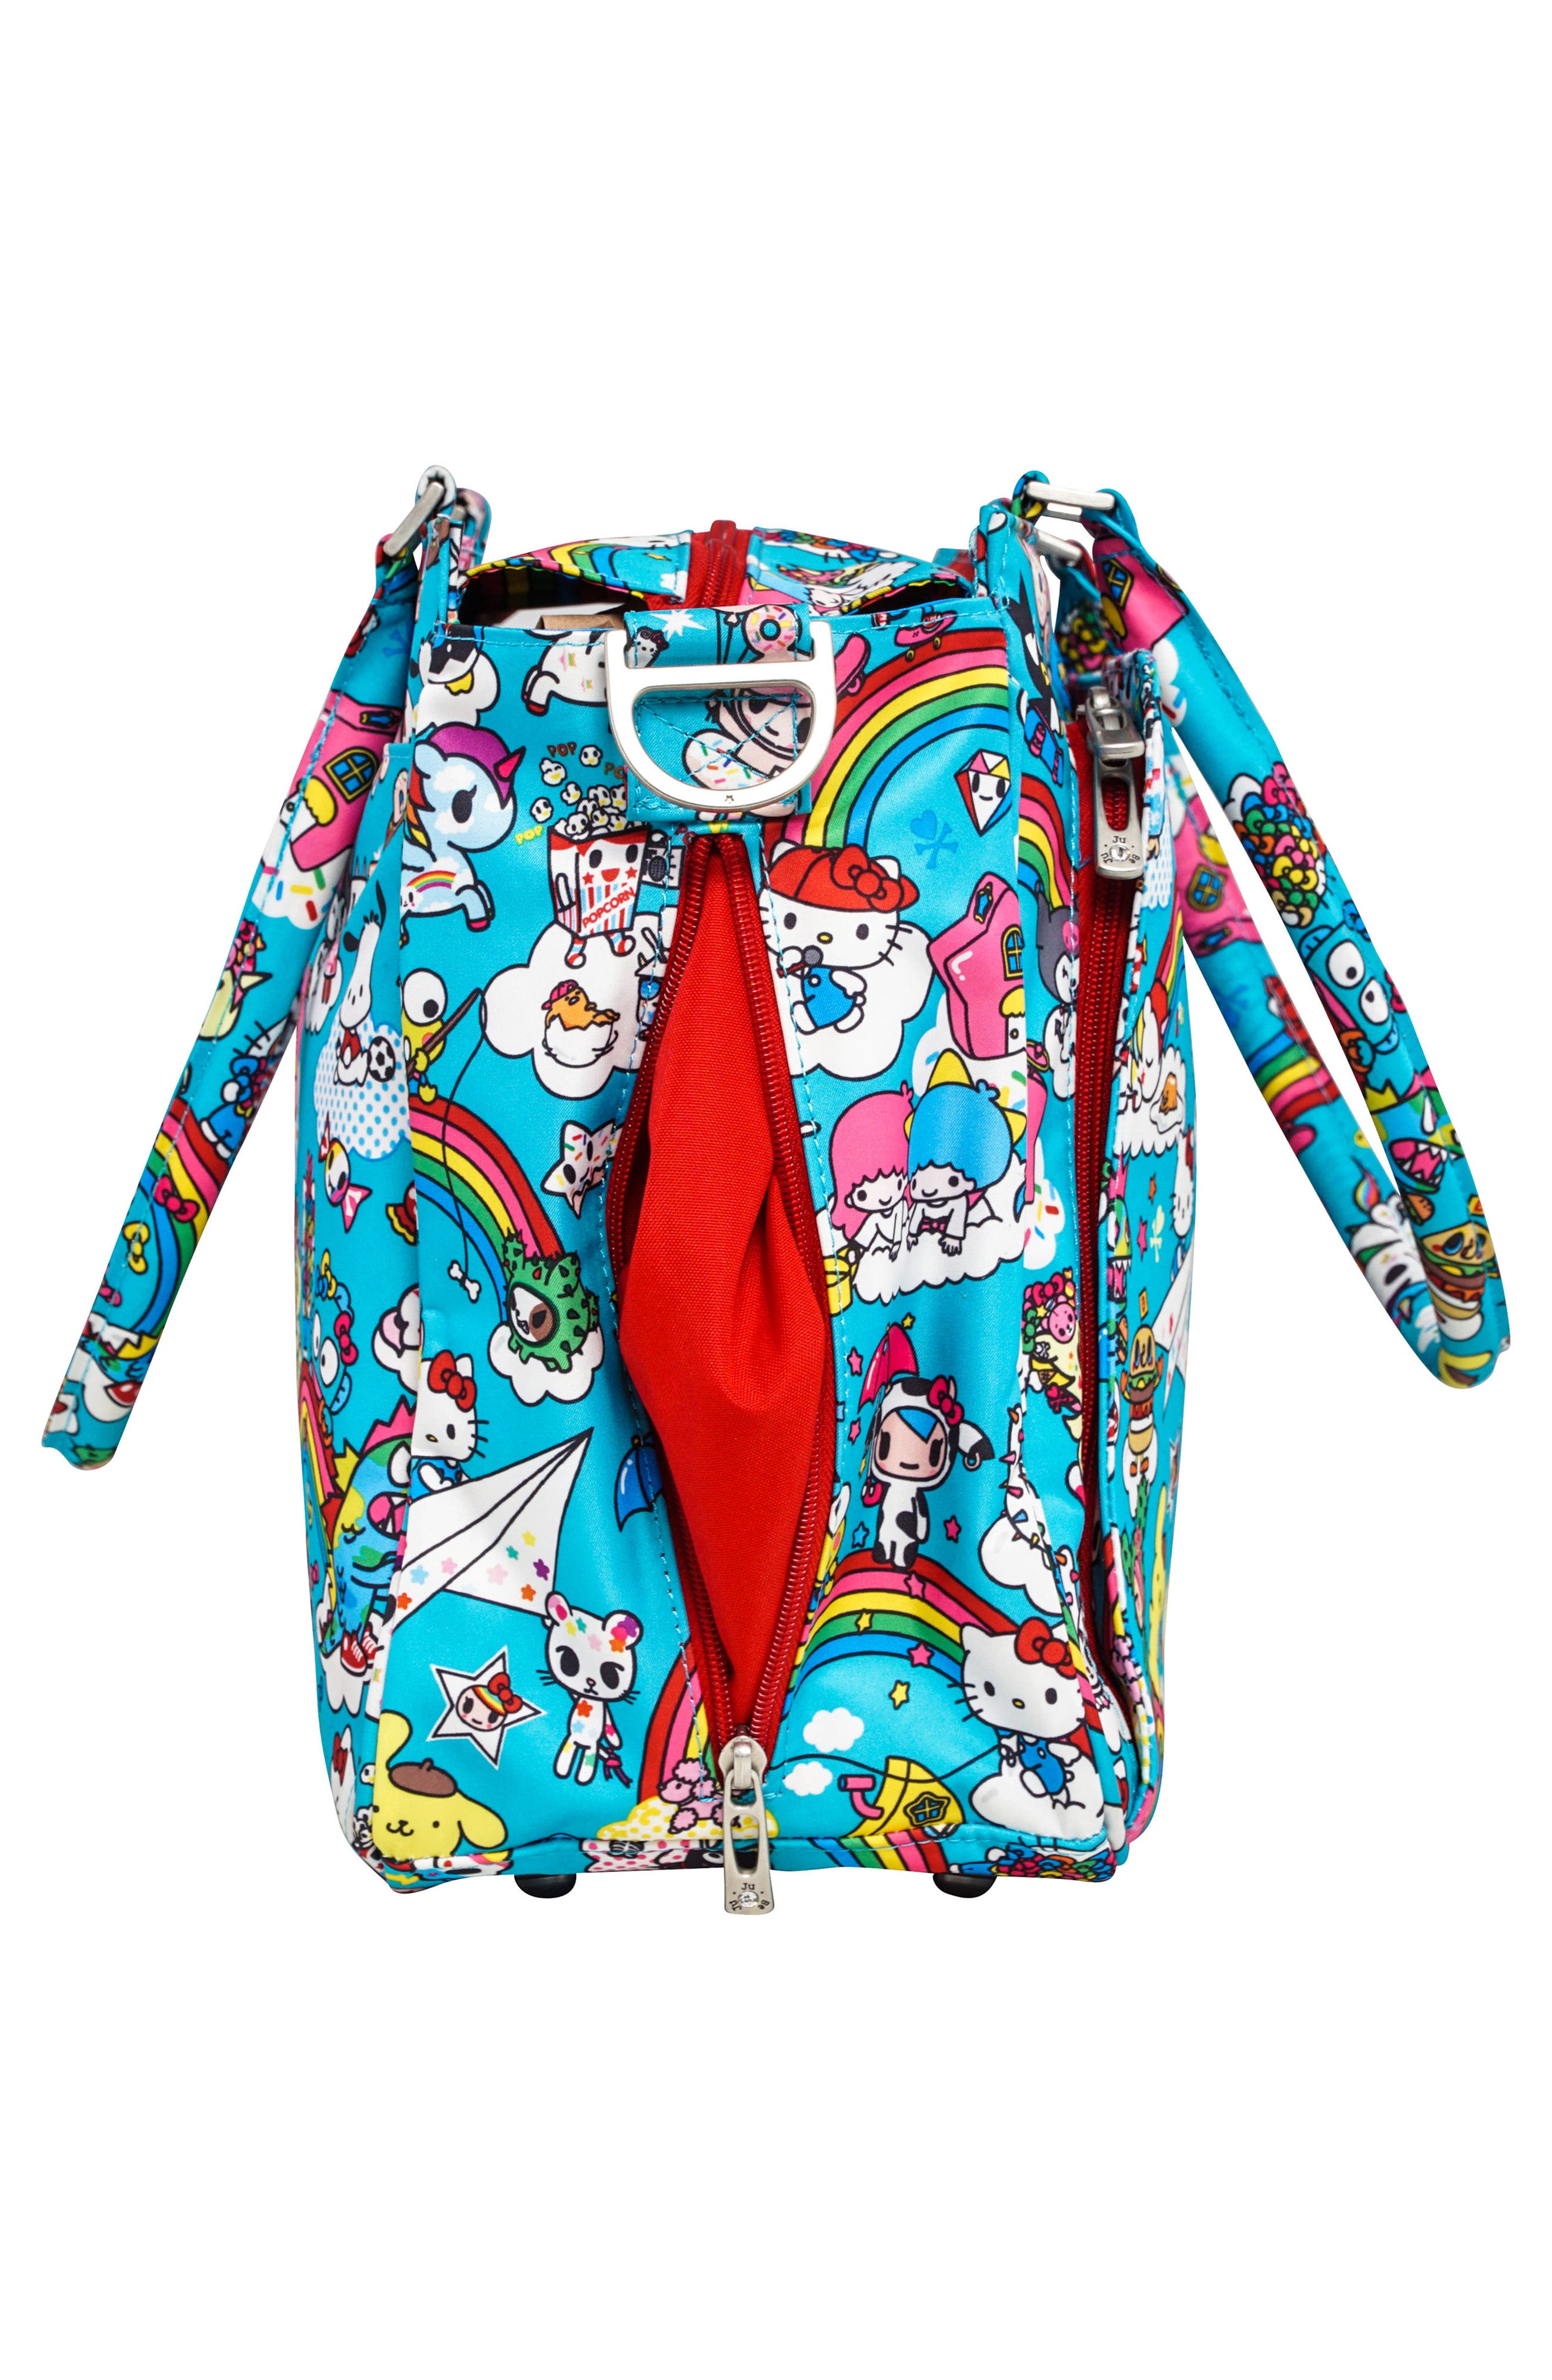 x tokidoki for Hello Sanrio Rainbow Dreams Classy Diaper Bag,                             Alternate thumbnail 2, color,